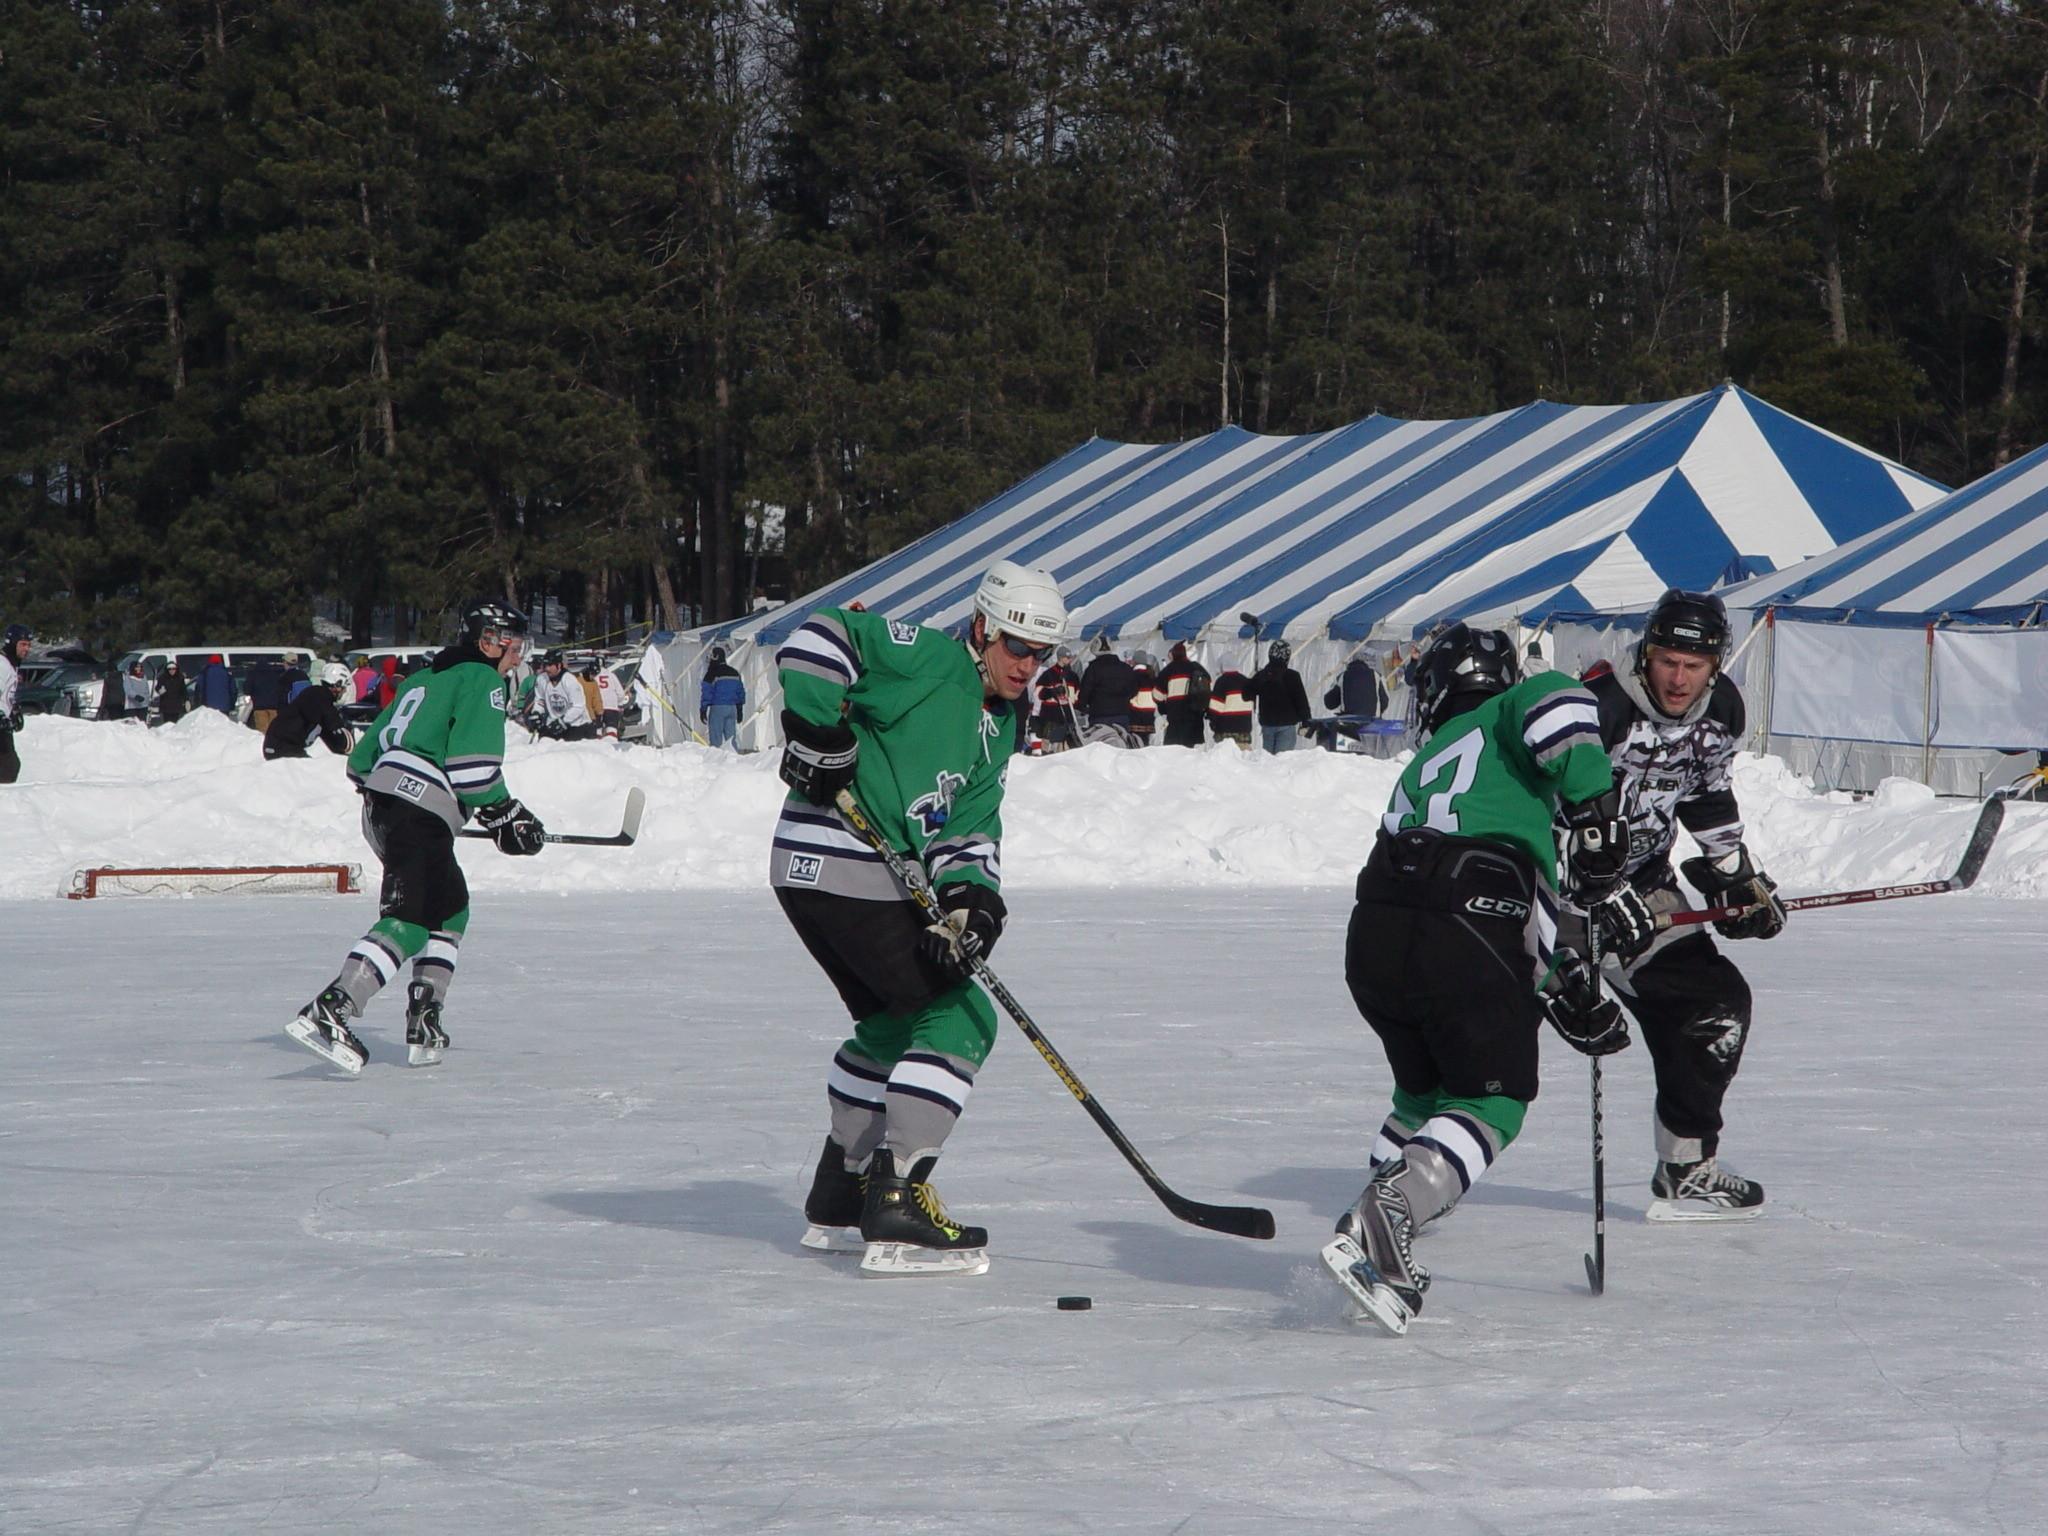 Res: 2048x1536, 14th Annual Labatt Blue USA Adult Pond Hockey Championships